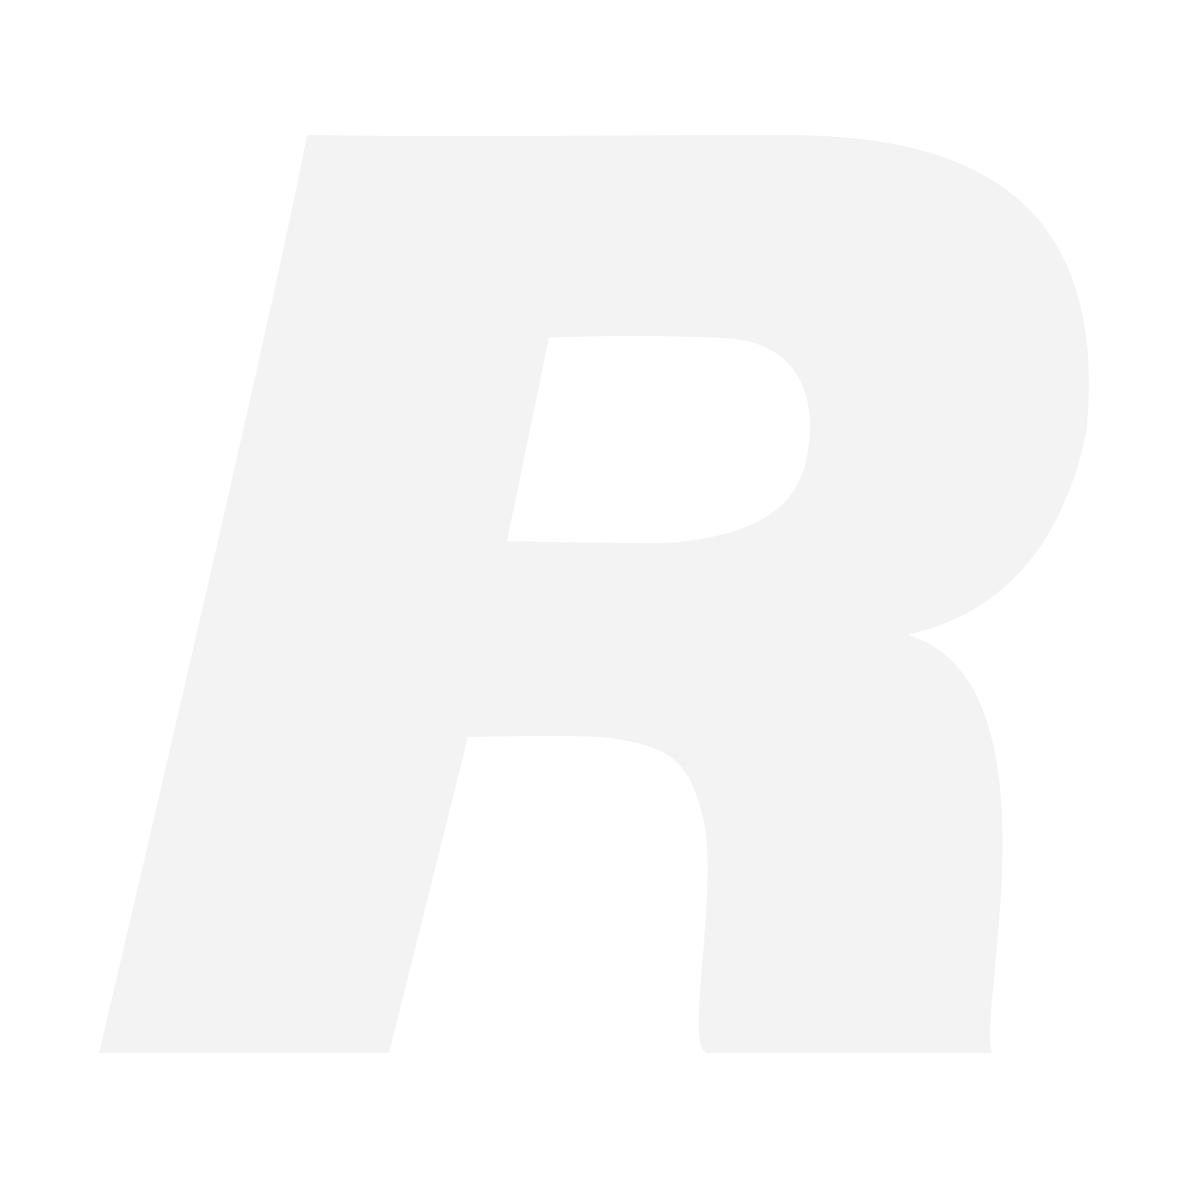 Zeiss Touit 12/2.8, Sony E